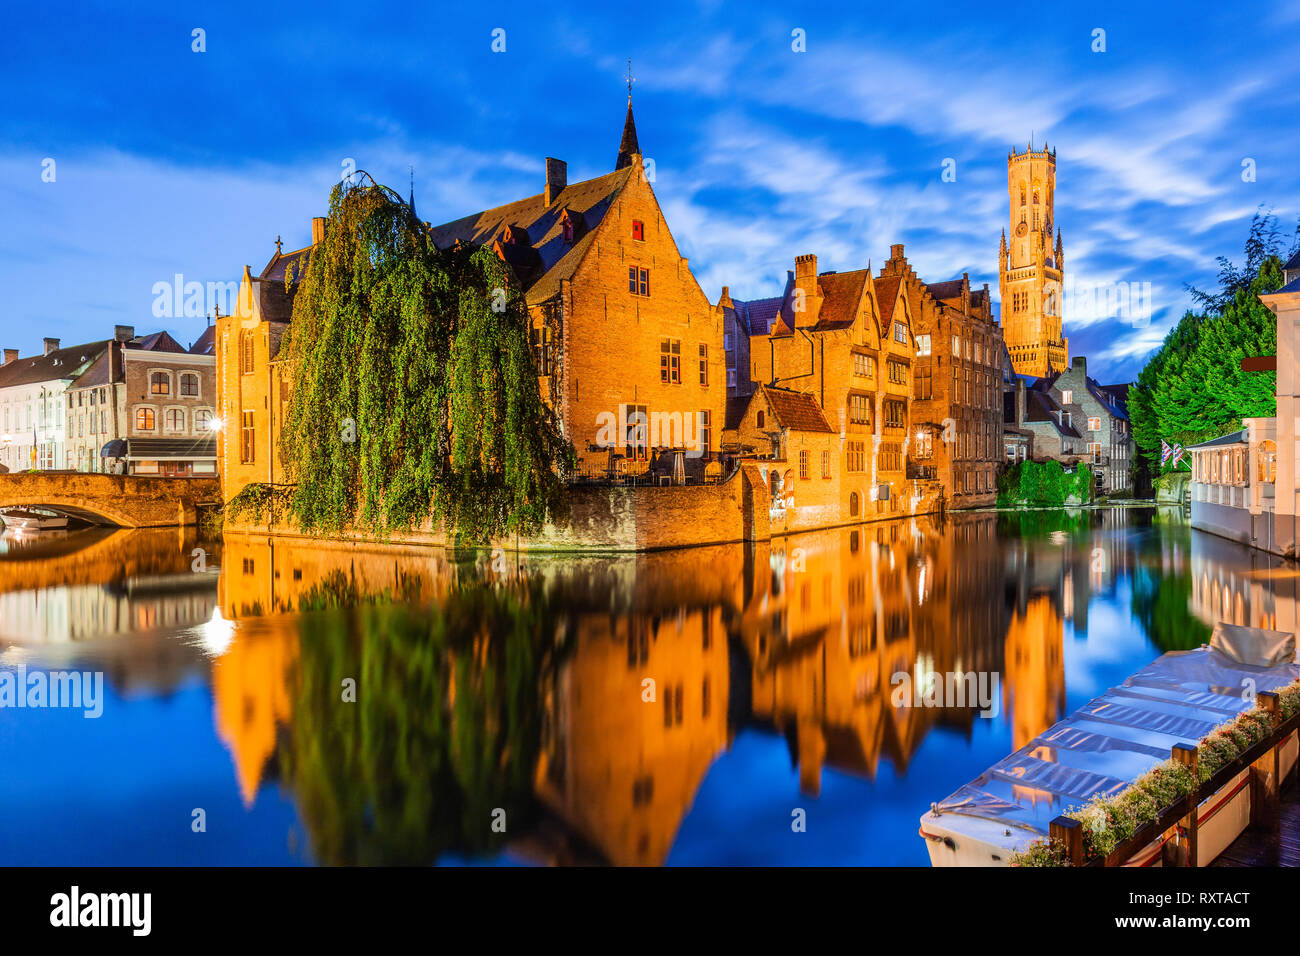 Bruges, Belgio. Il canale di Rozenhoedkaai in Bruges con il campanile in background. Foto Stock